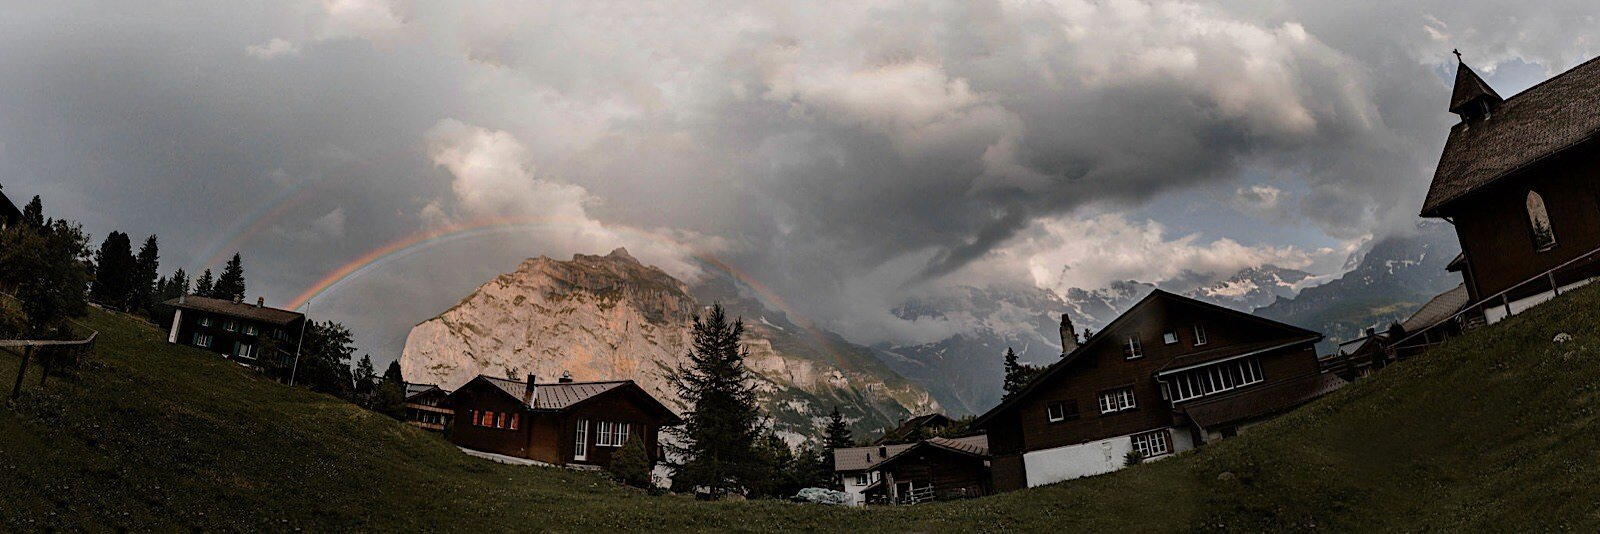 Swiss Alps Photographer Murren Fotomagoria 4.jpg